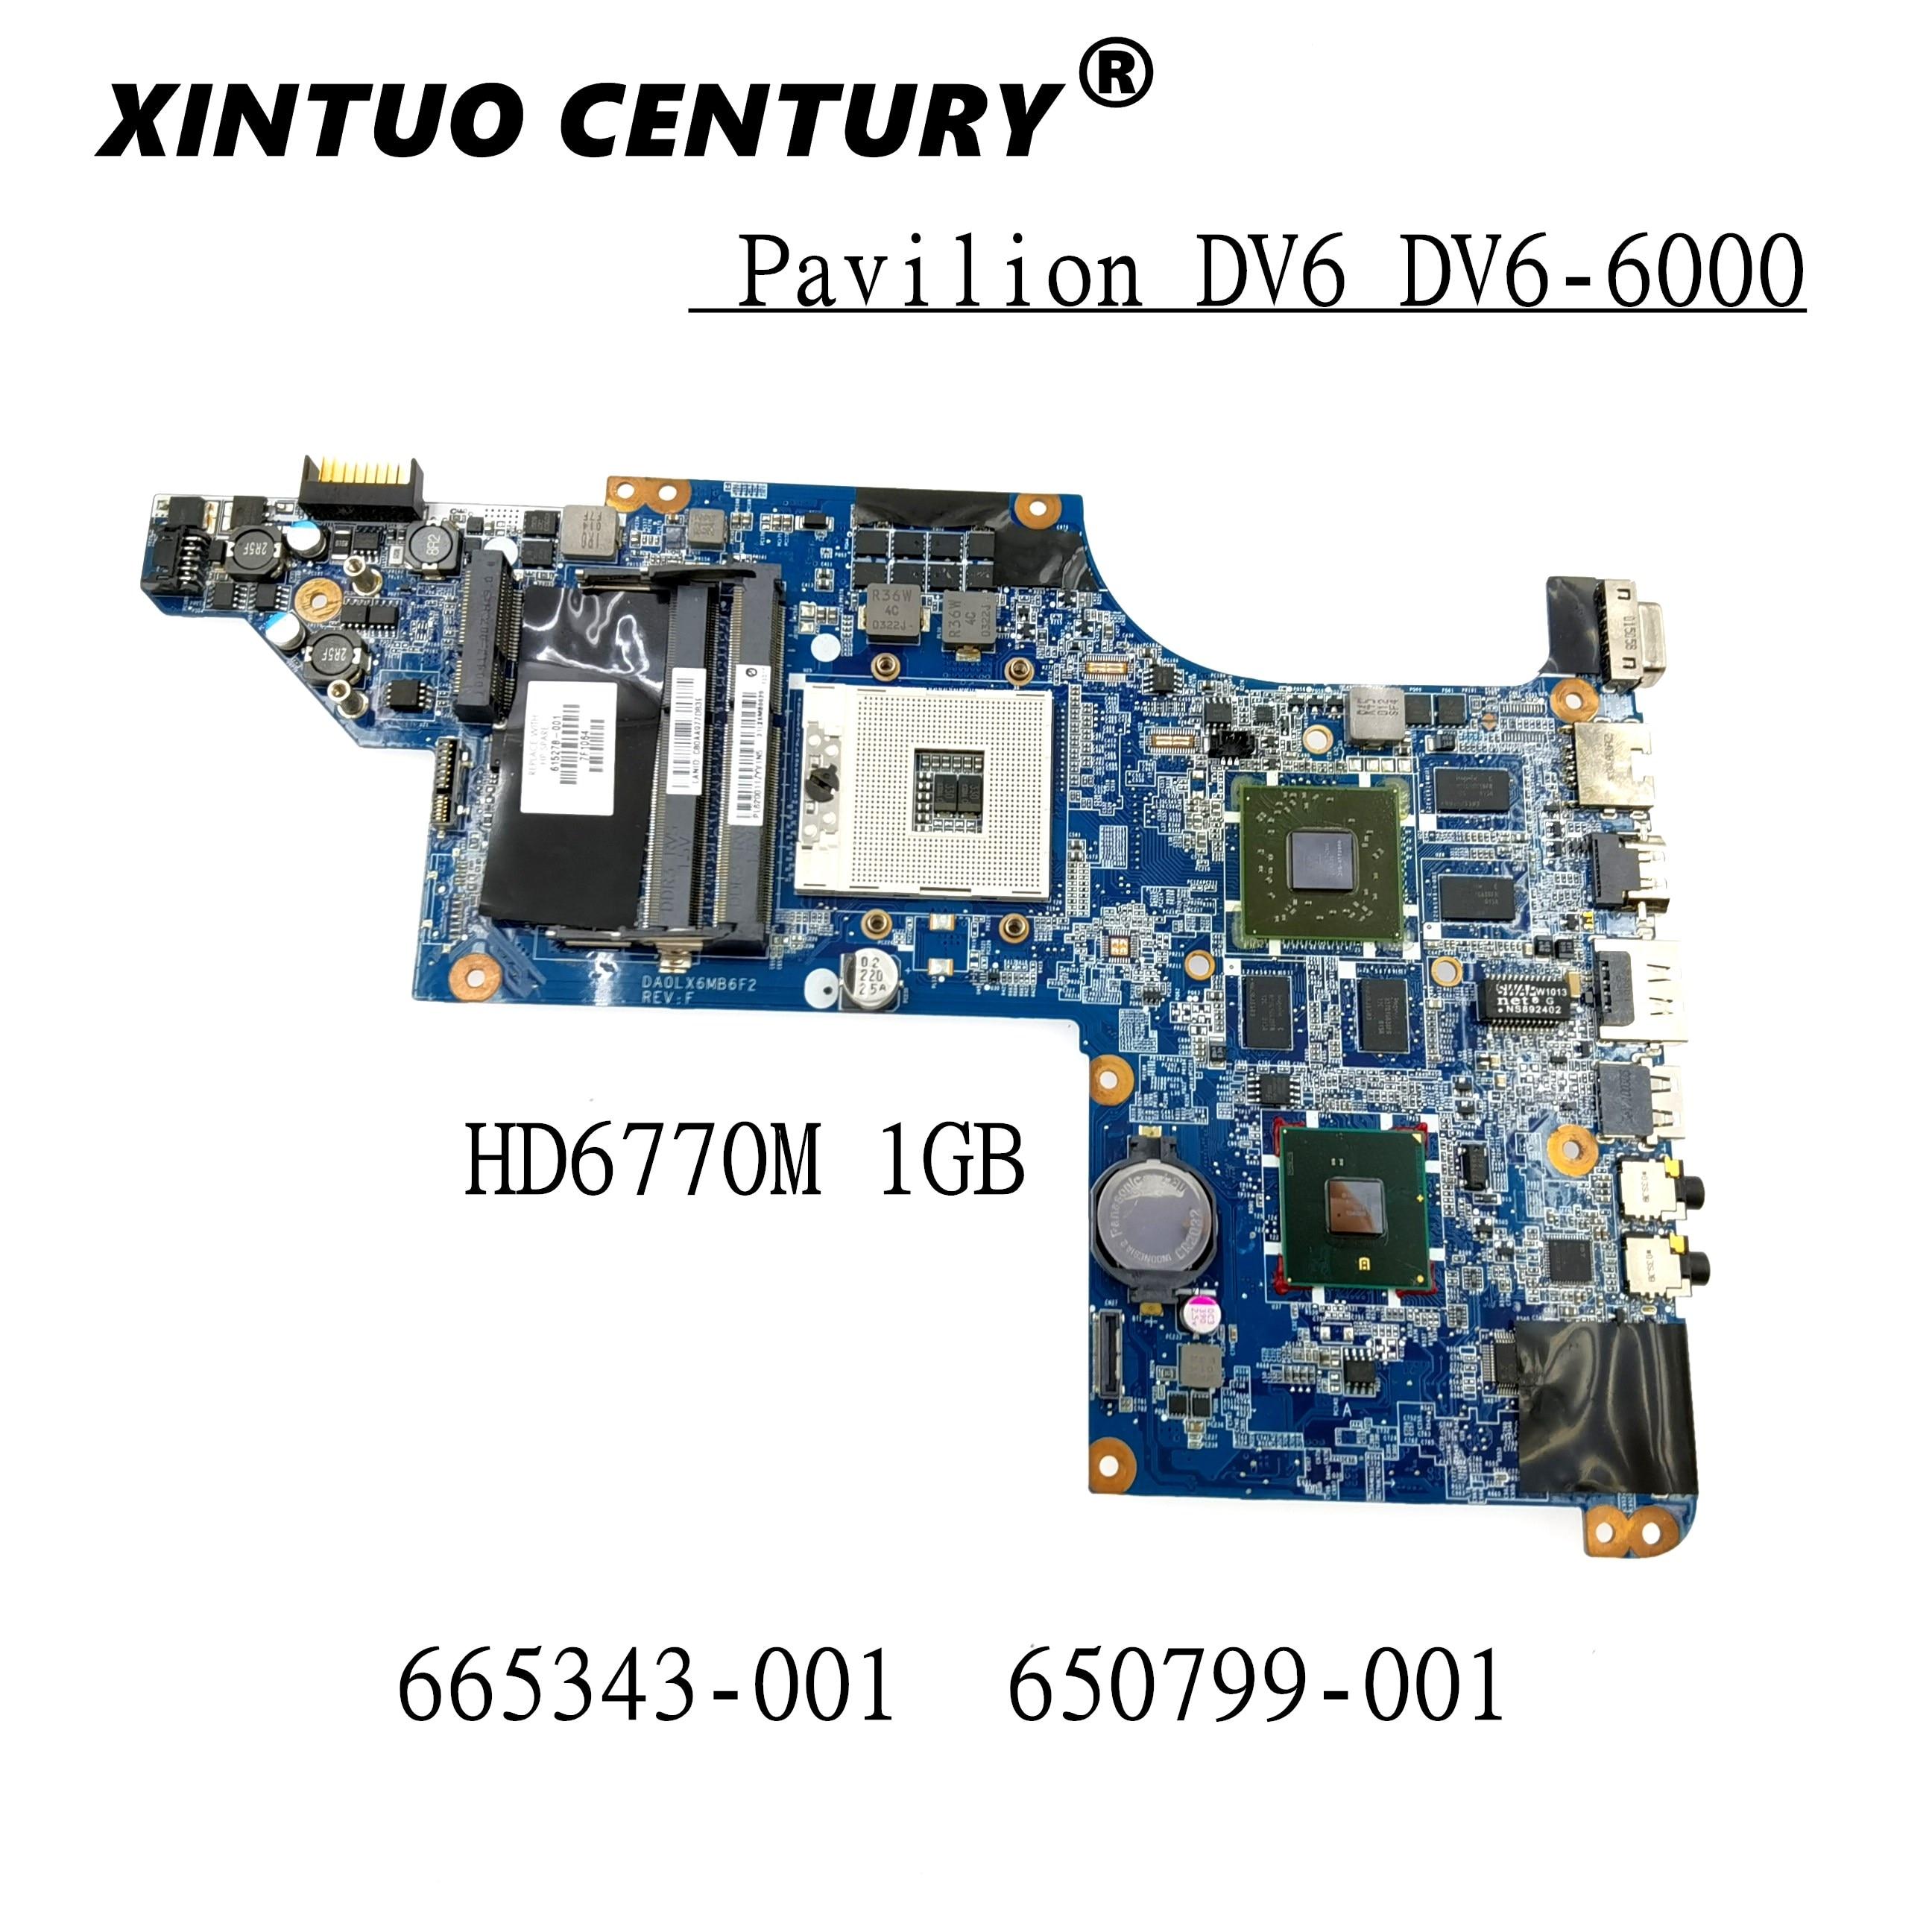 650799-001 665343-001 Tablero Principal para HP Pavilion DV6 DV6-6000 placa base de...